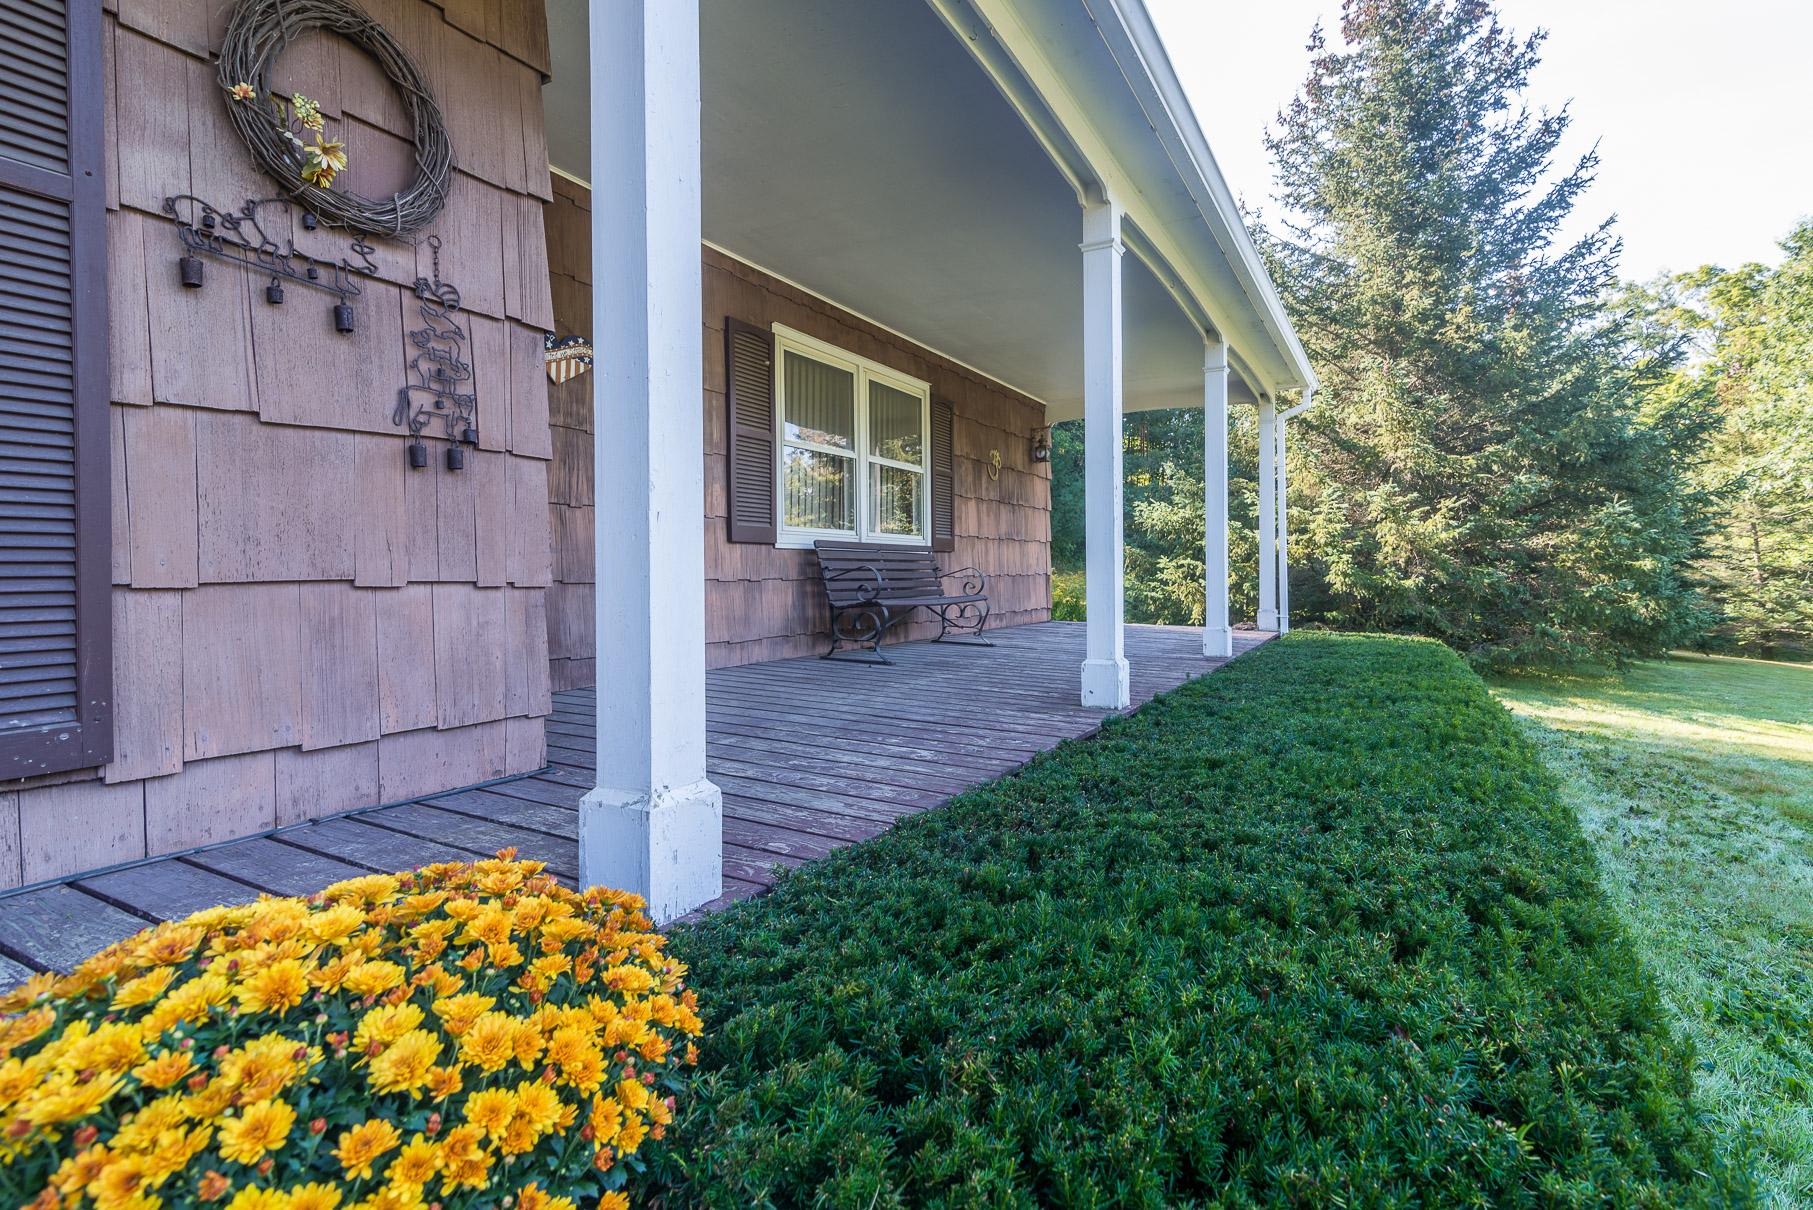 独户住宅 为 销售 在 Three Bedroom House with Two Bedroom Apartment 2500 Pawlet Mountain Rd 鲁帕特, 佛蒙特州 05776 美国